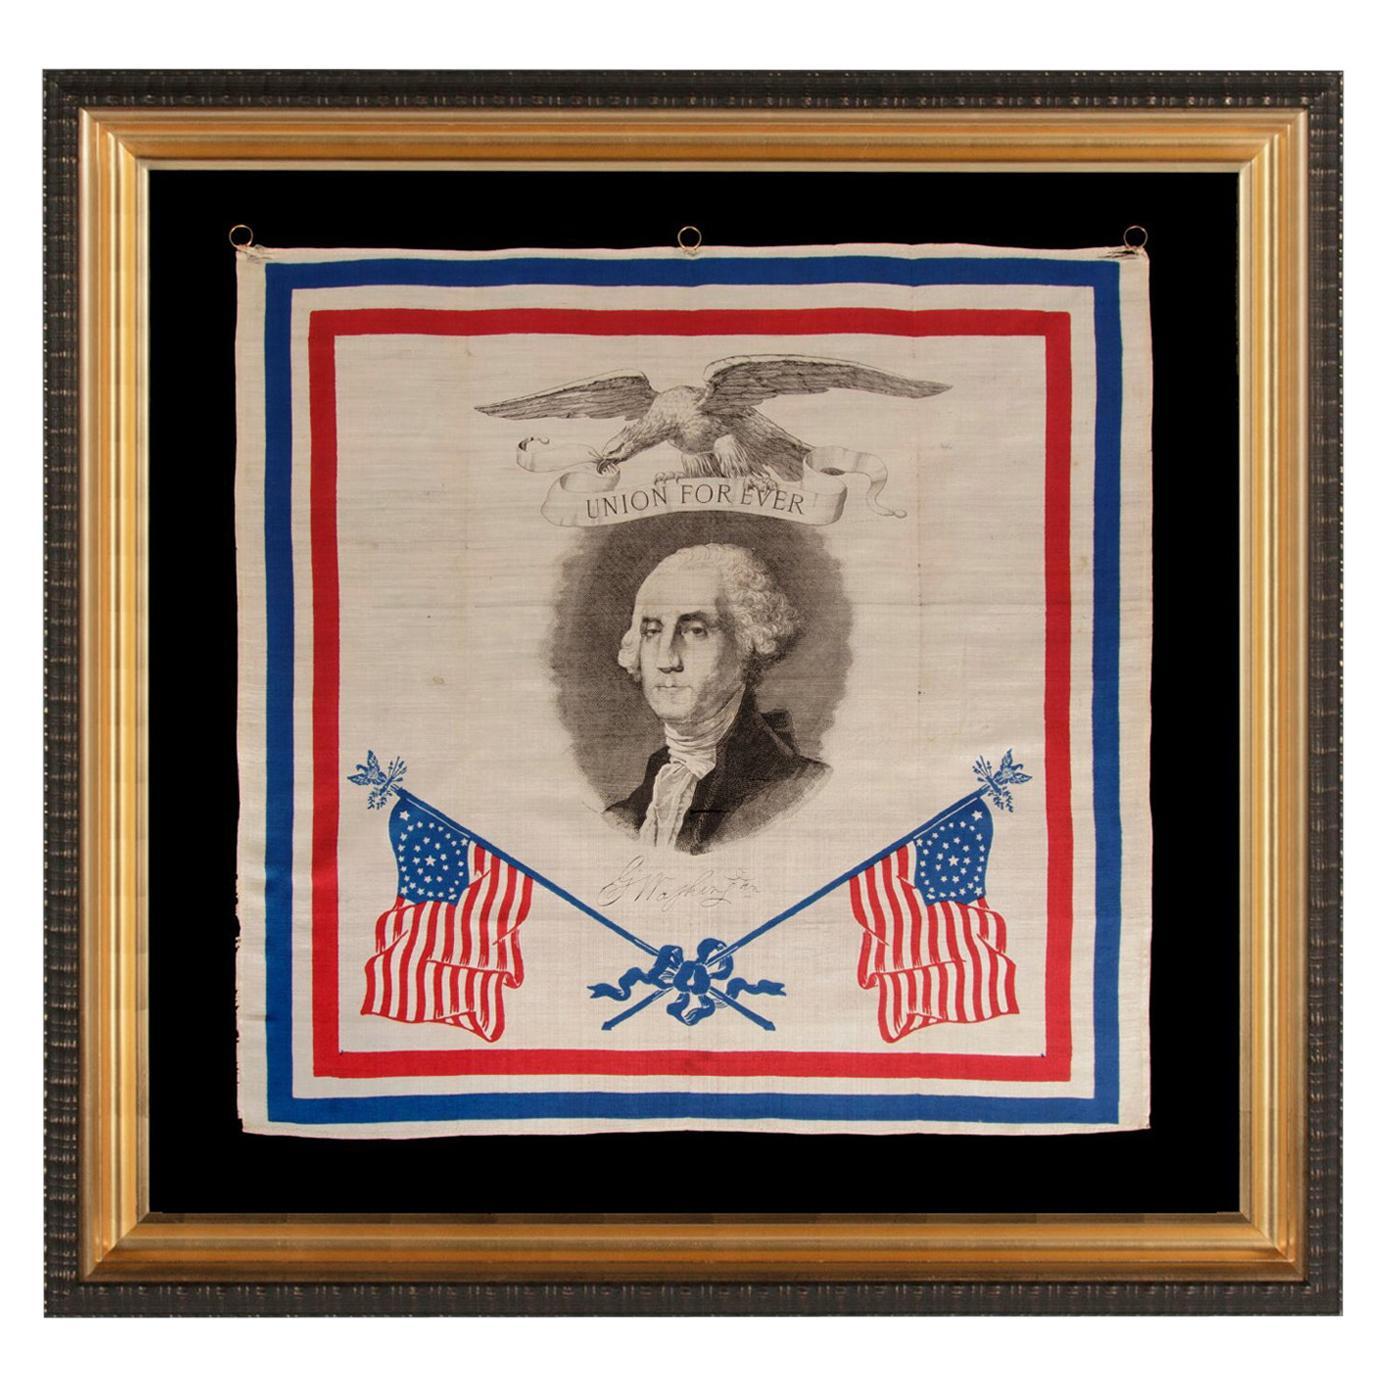 Patriotic Silk Kerchief w/ 34 Star Flags & an Image of Washington, Civil War Era